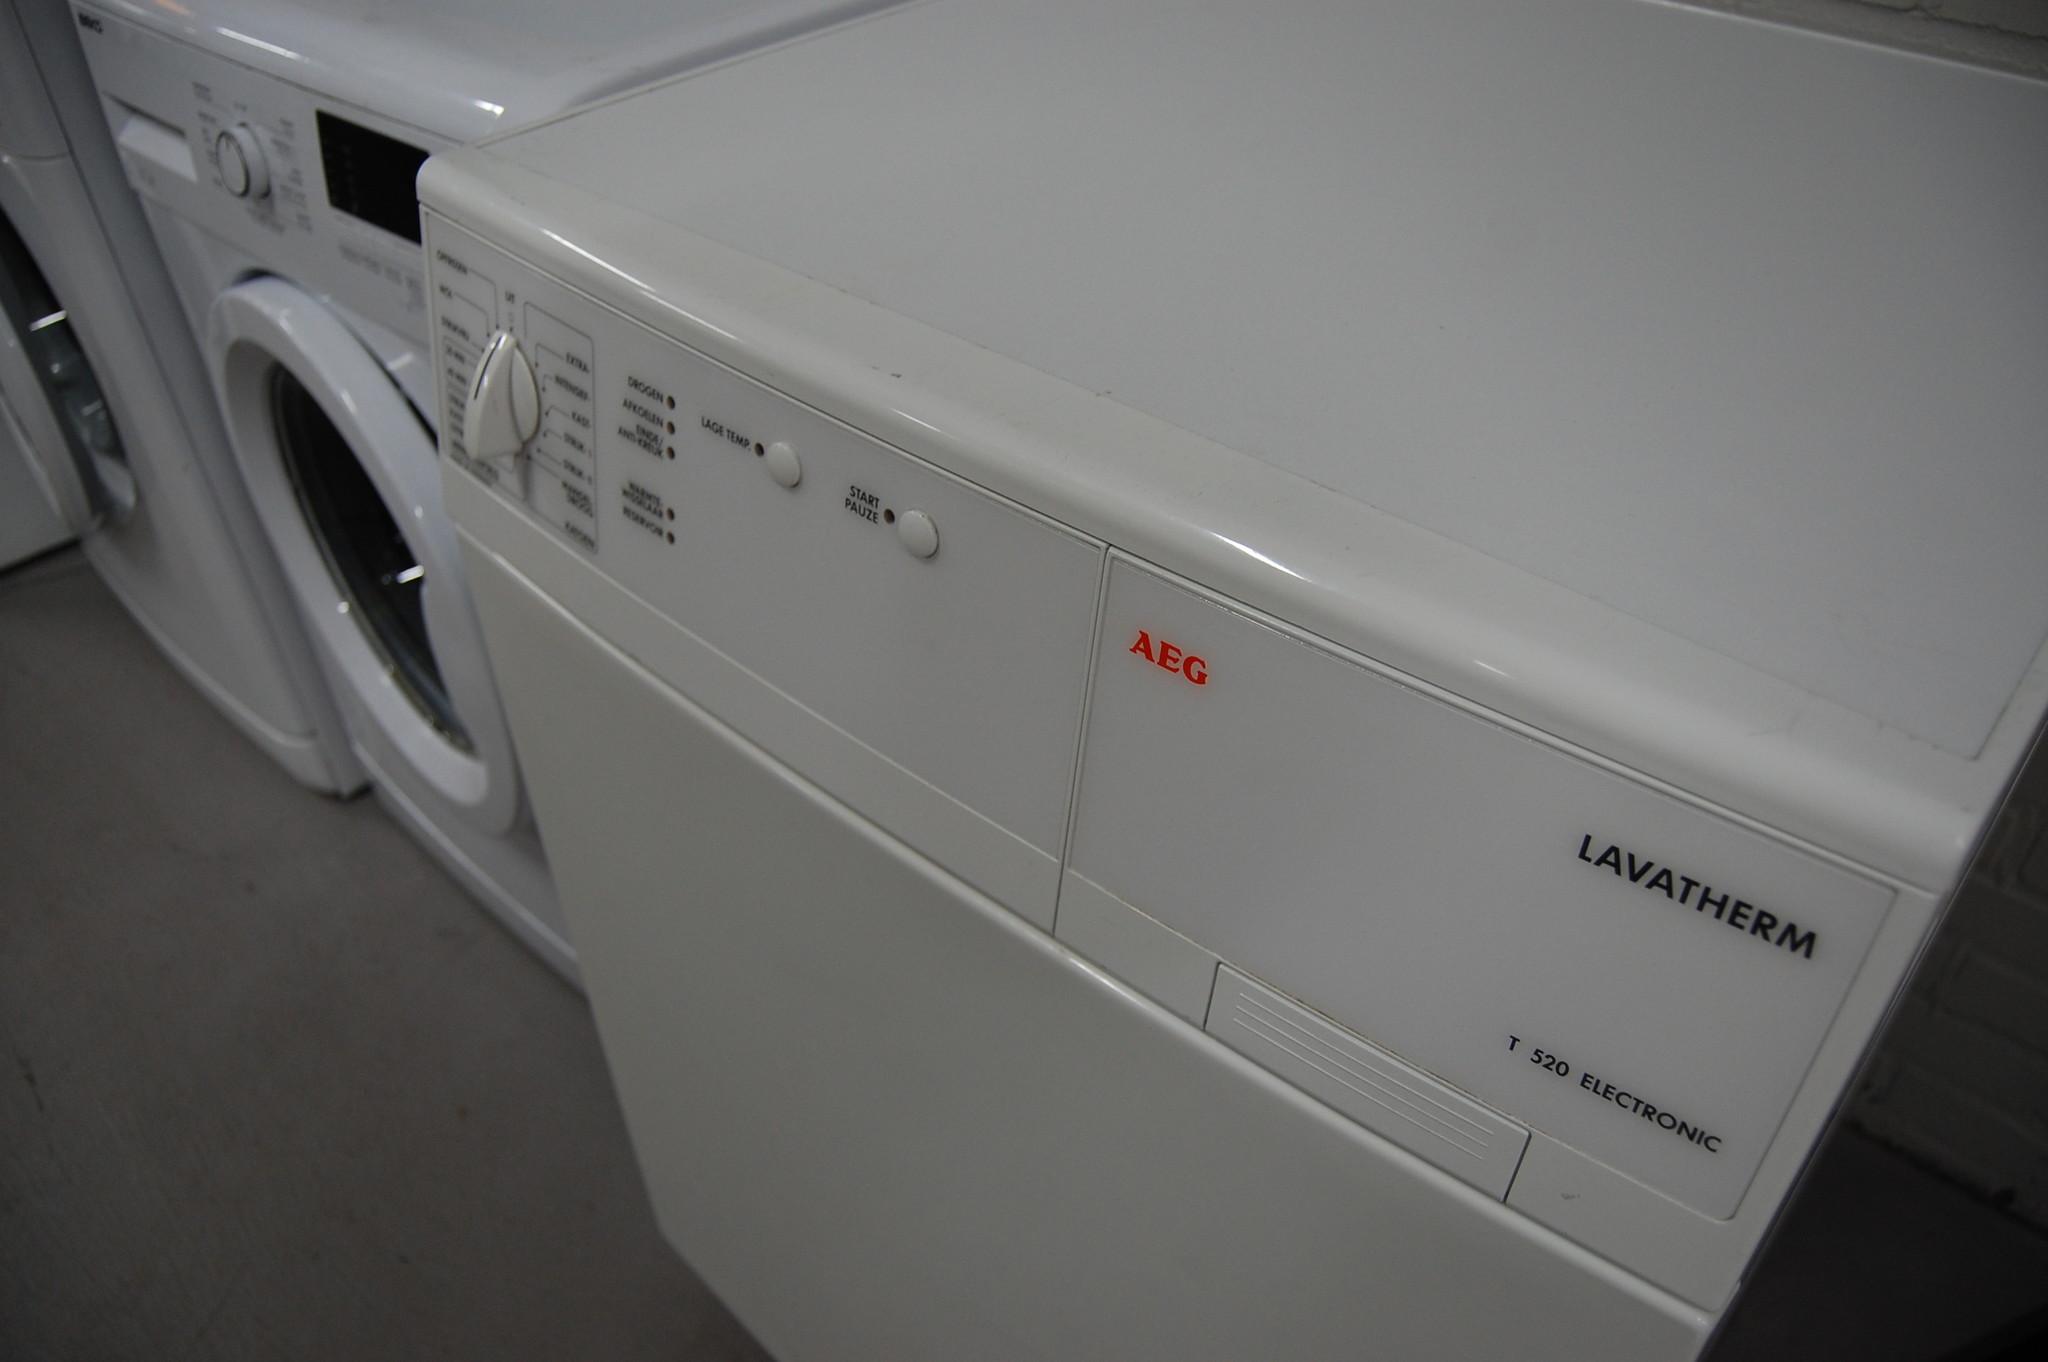 AEG Lavatherm T520 Condensdroger